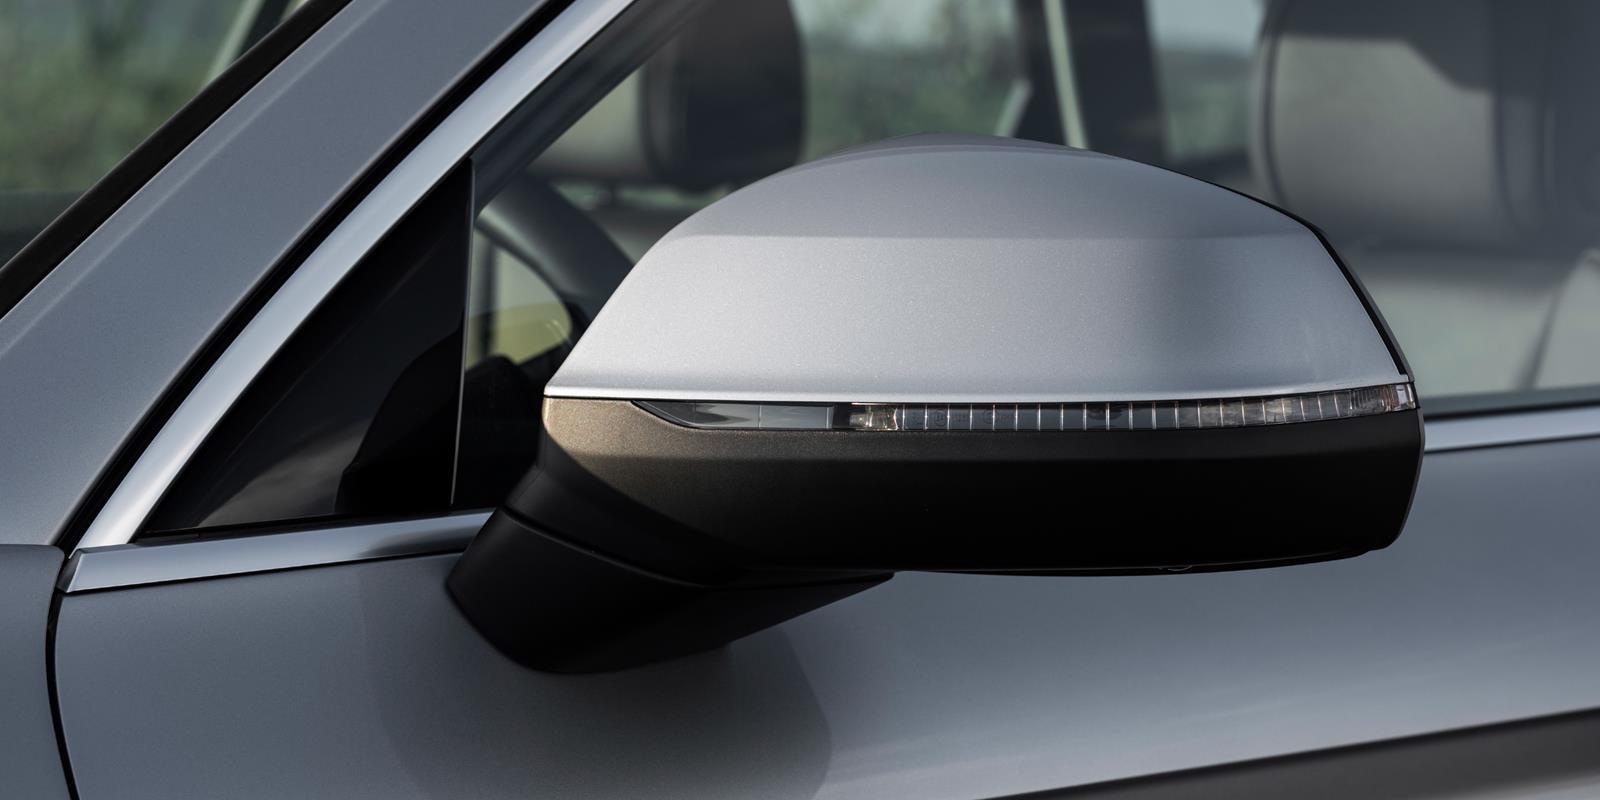 Audi Q5 photo 171908